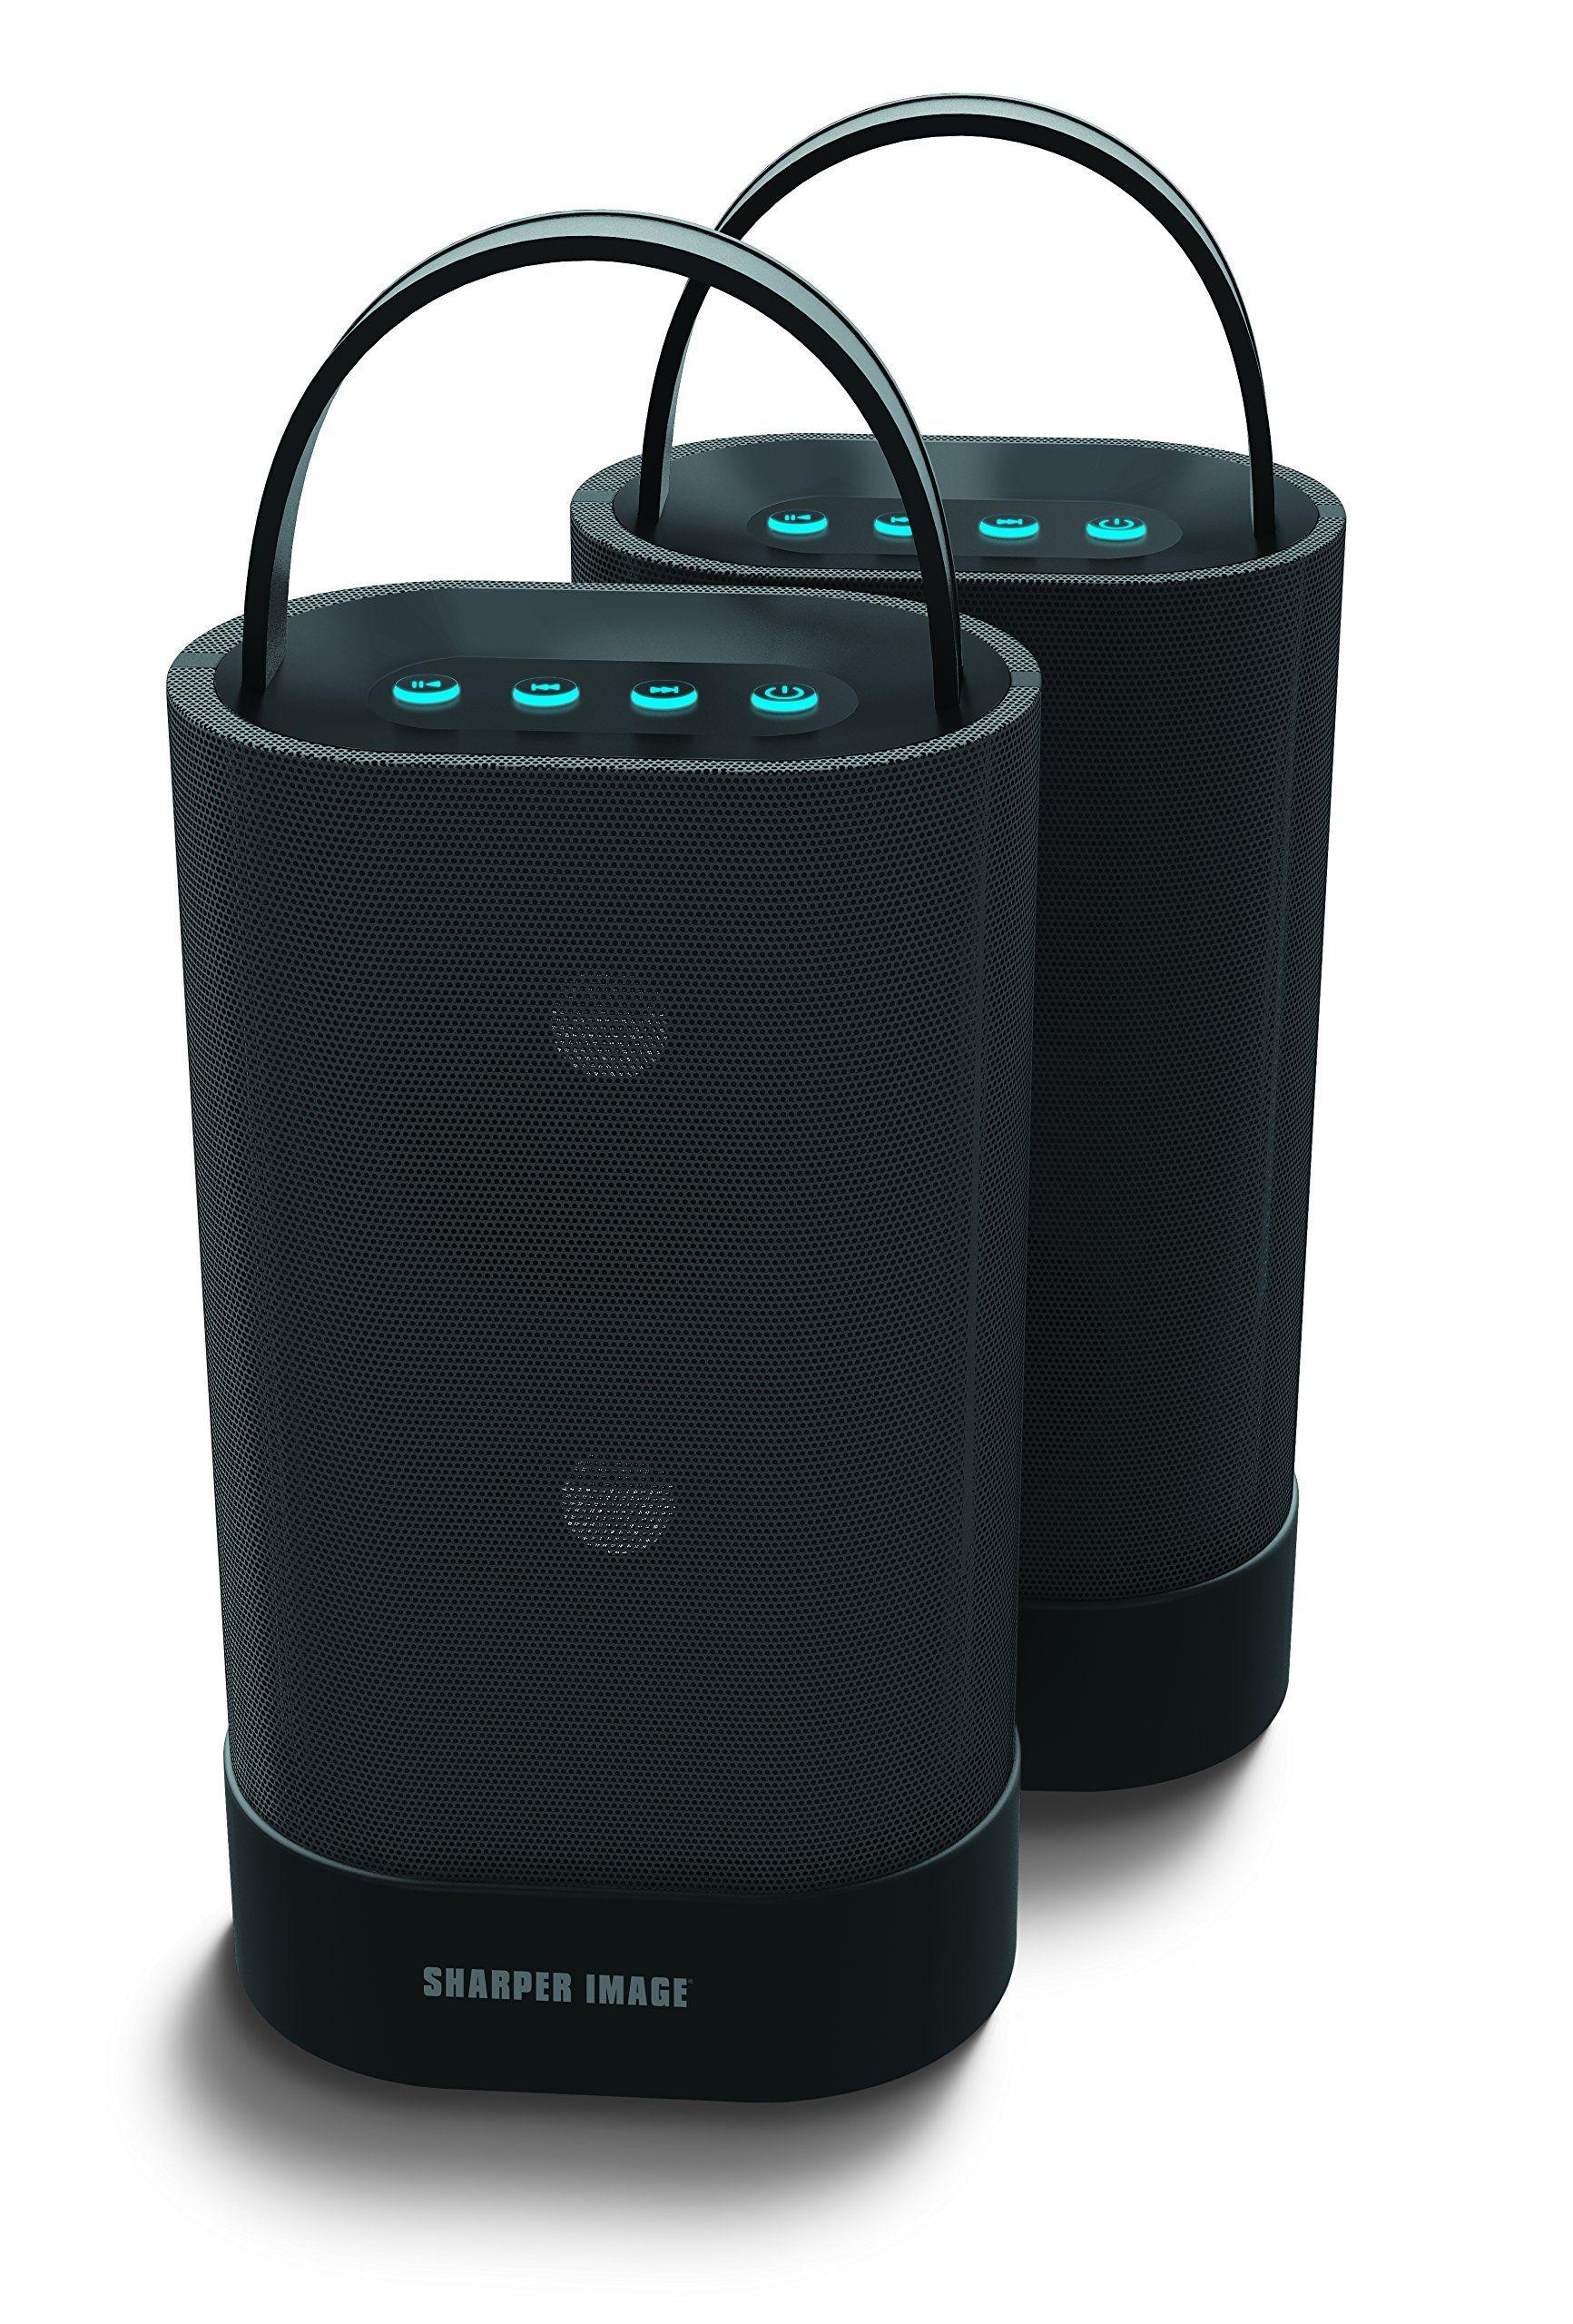 Sharper Image Sbt615 2bk Two Wireless Bluetooth 40 Speakers Works